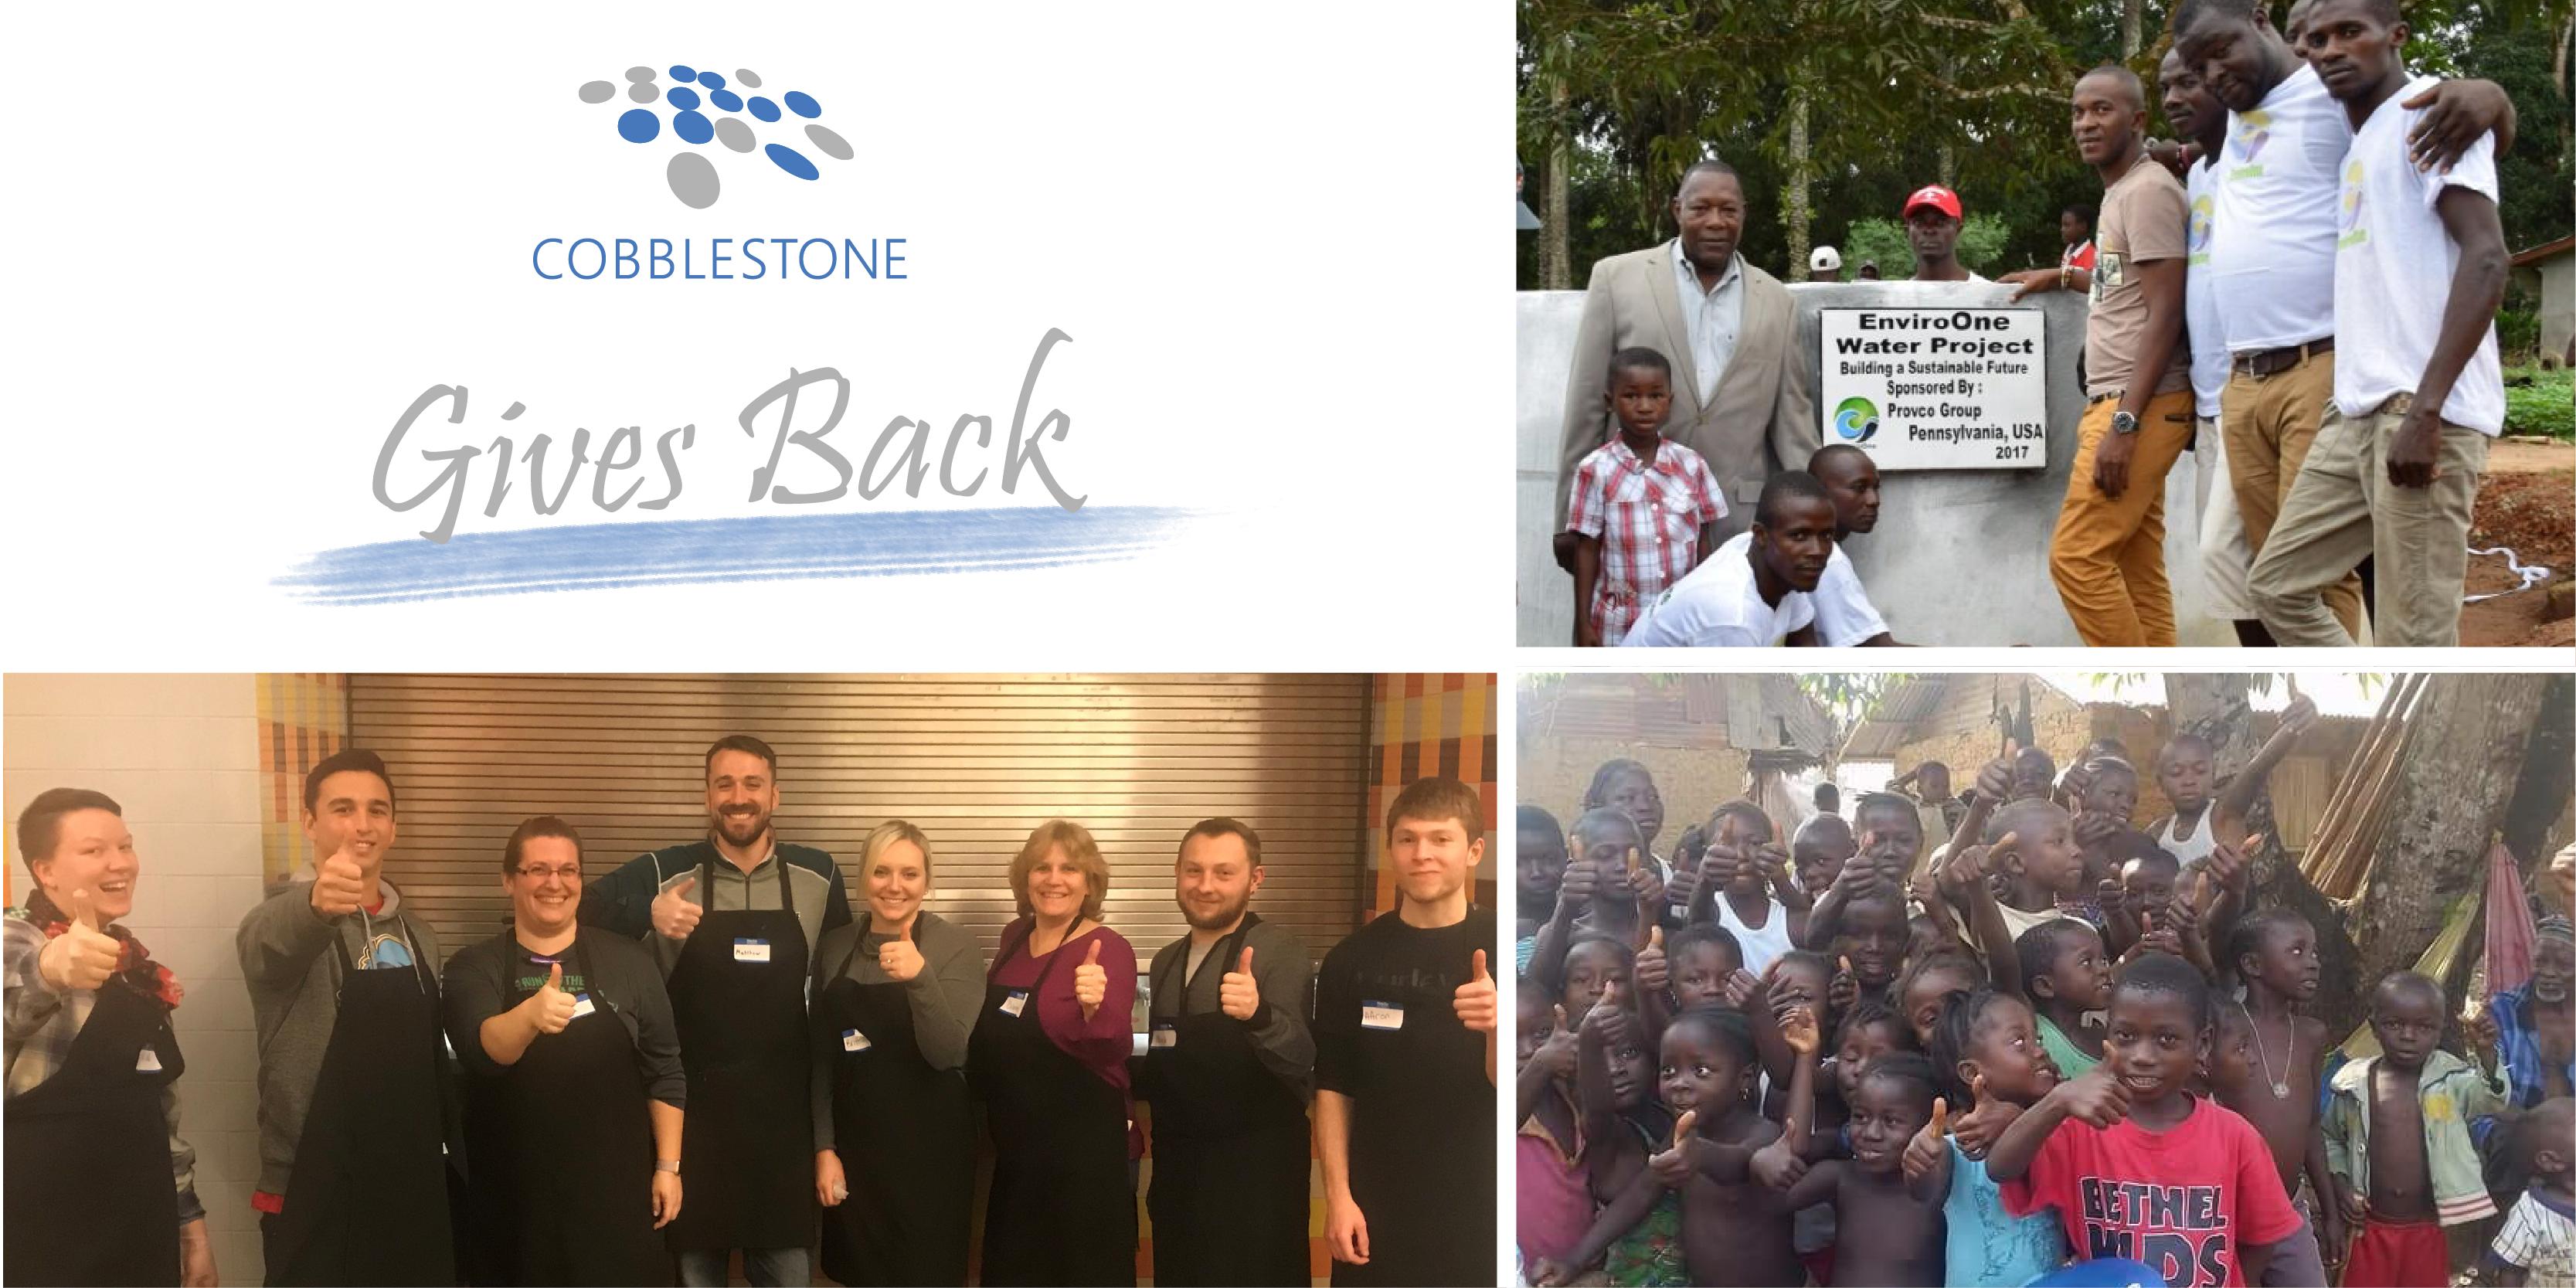 CobbleStone Gives Back